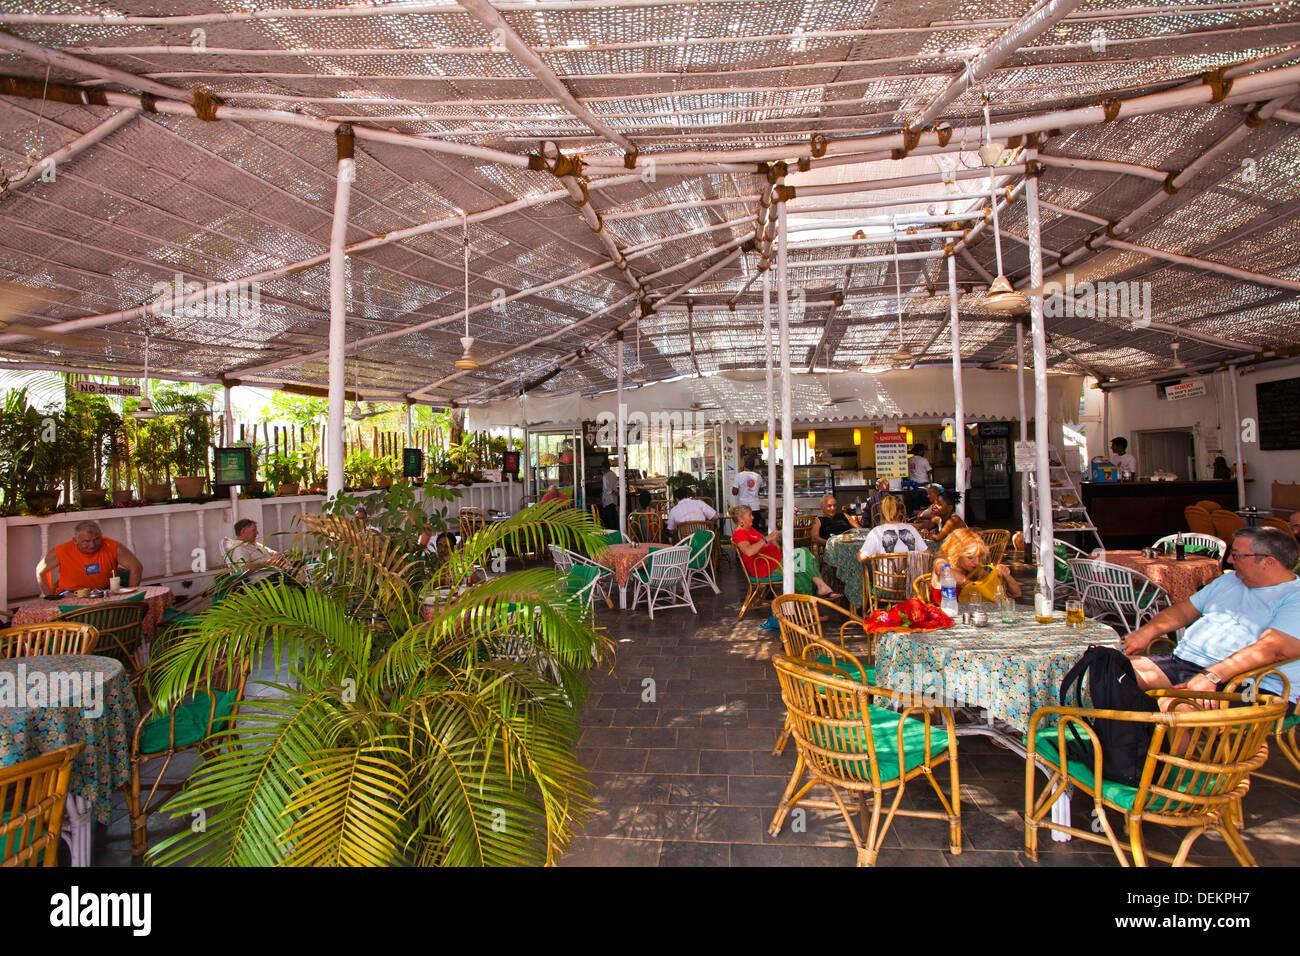 Tourists in a restaurant, Lila Cafe, Calangute, North Goa, Goa, India - Stock Image